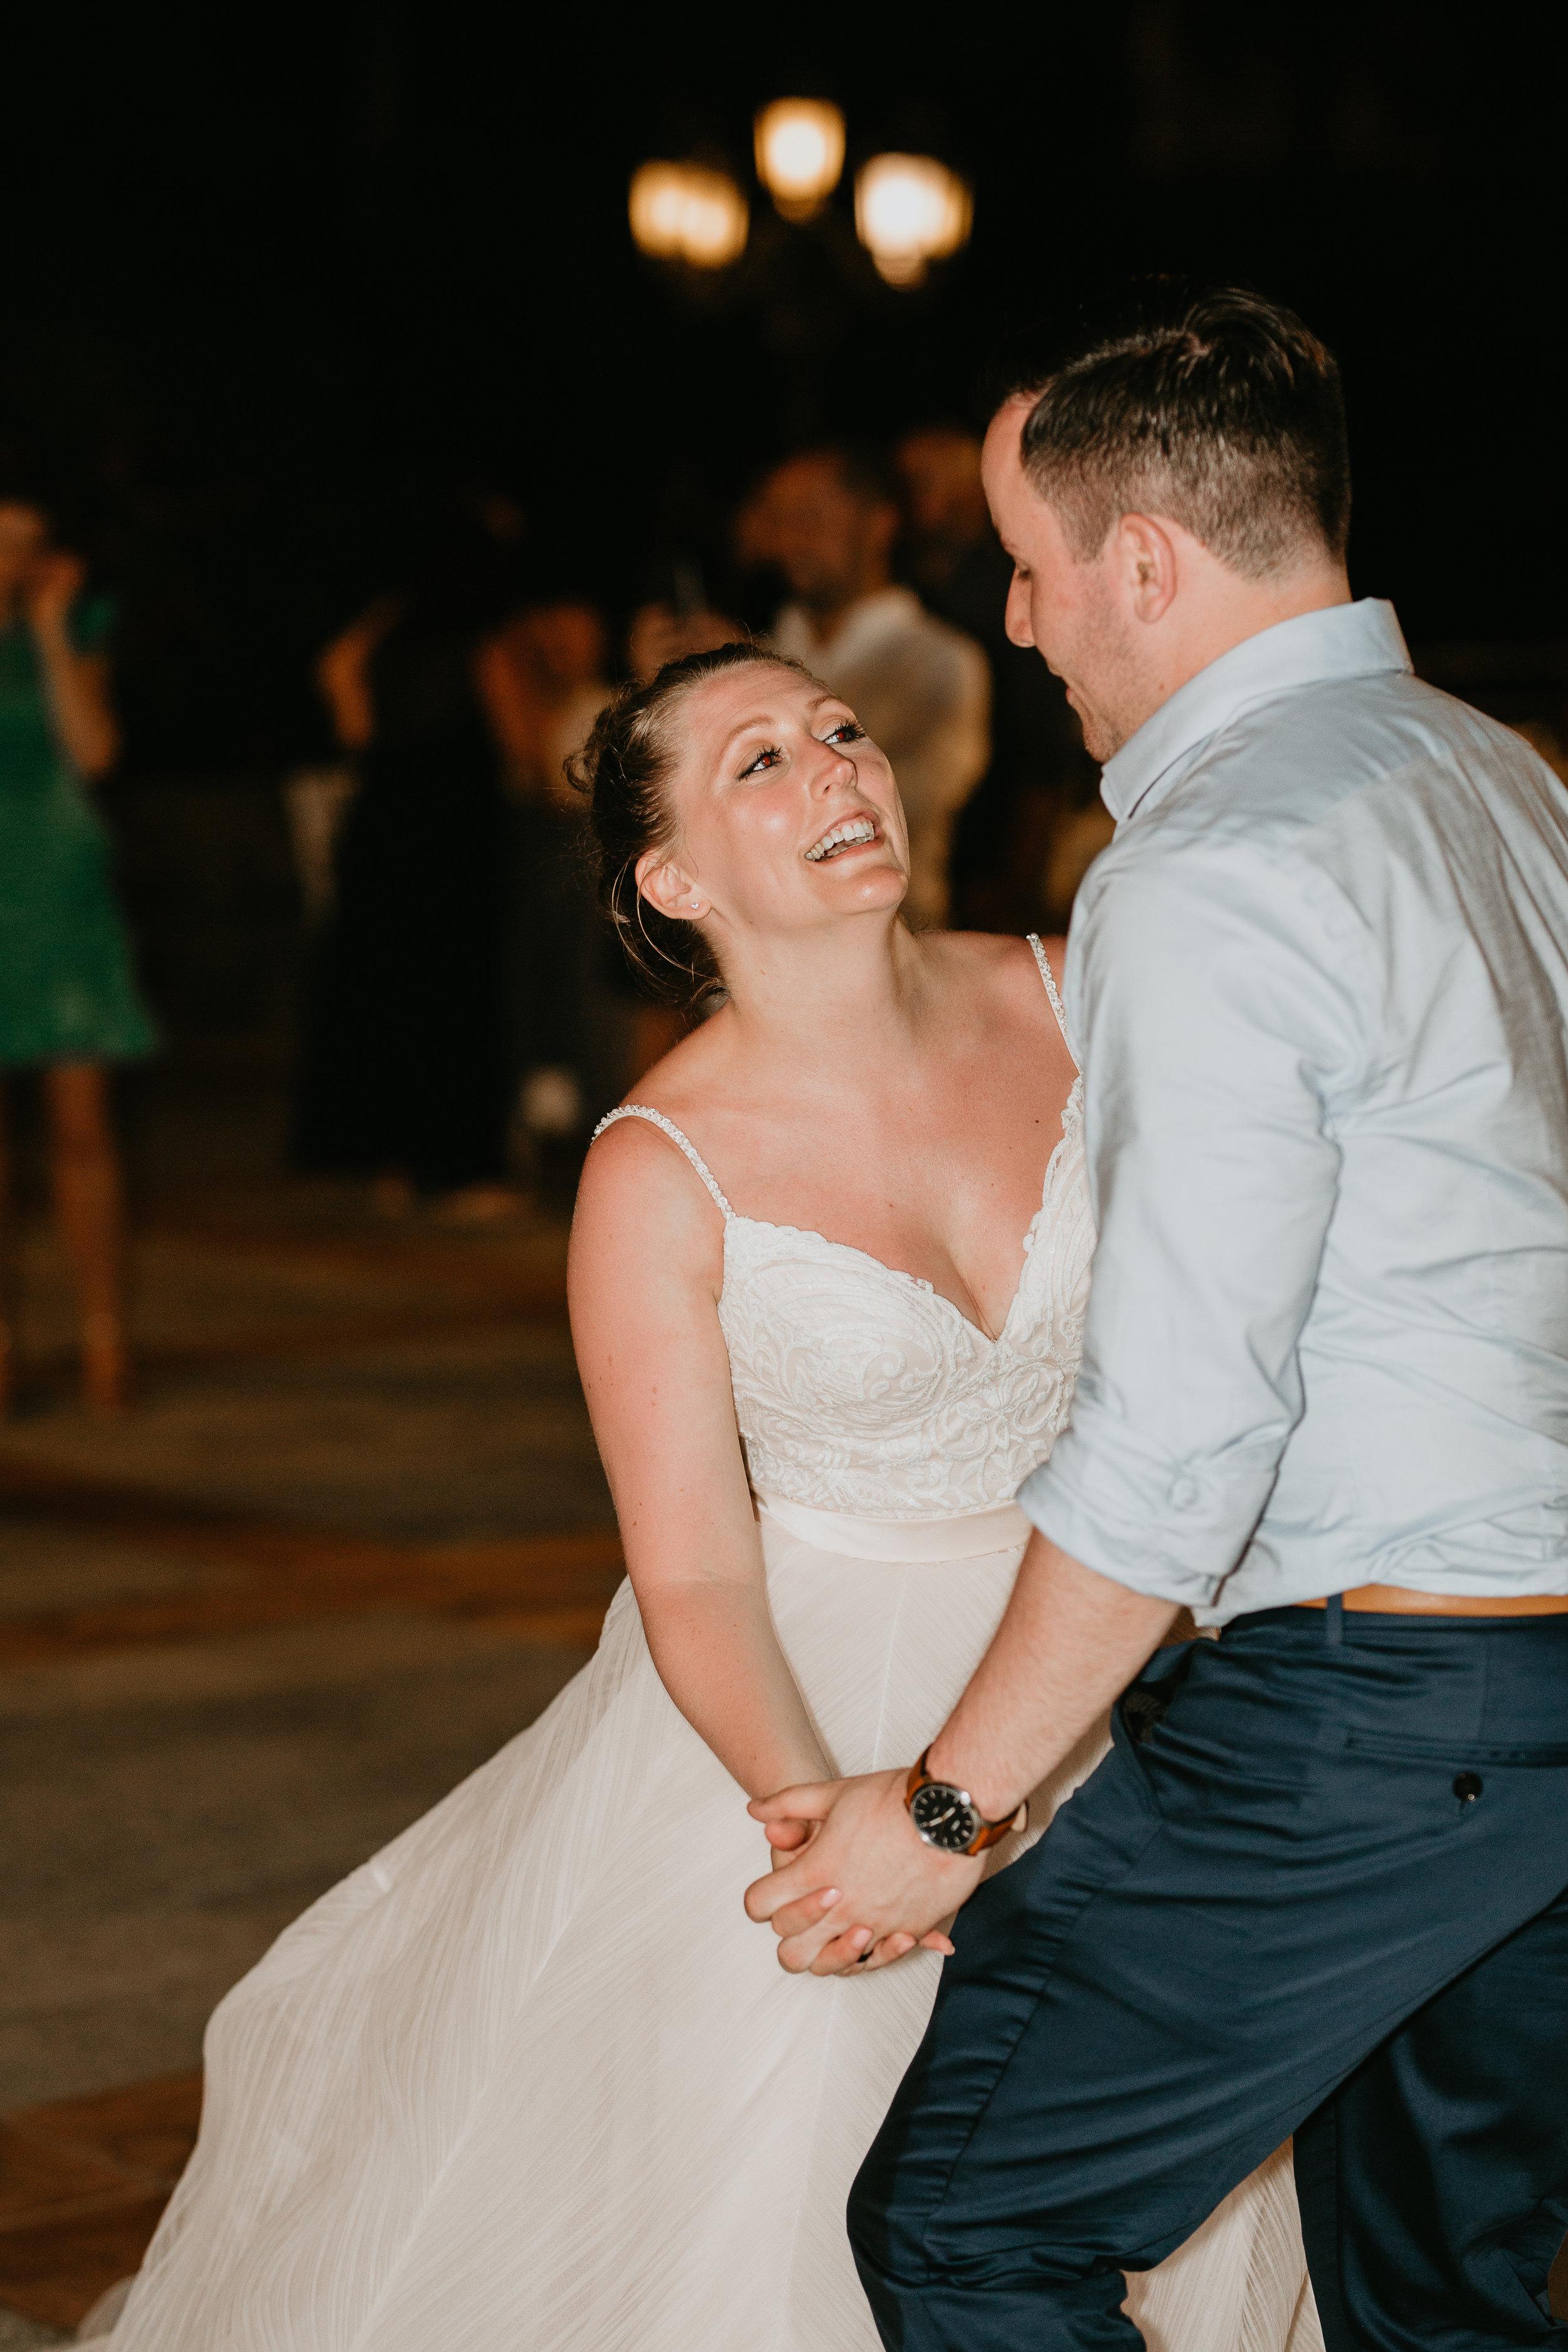 nicole-daacke-photography-destination-wedding-in-st-lucia-sandals-la-toc-intimate-island-wedding-carribean-elopement-photographer-chill-island-wedding-164.jpg